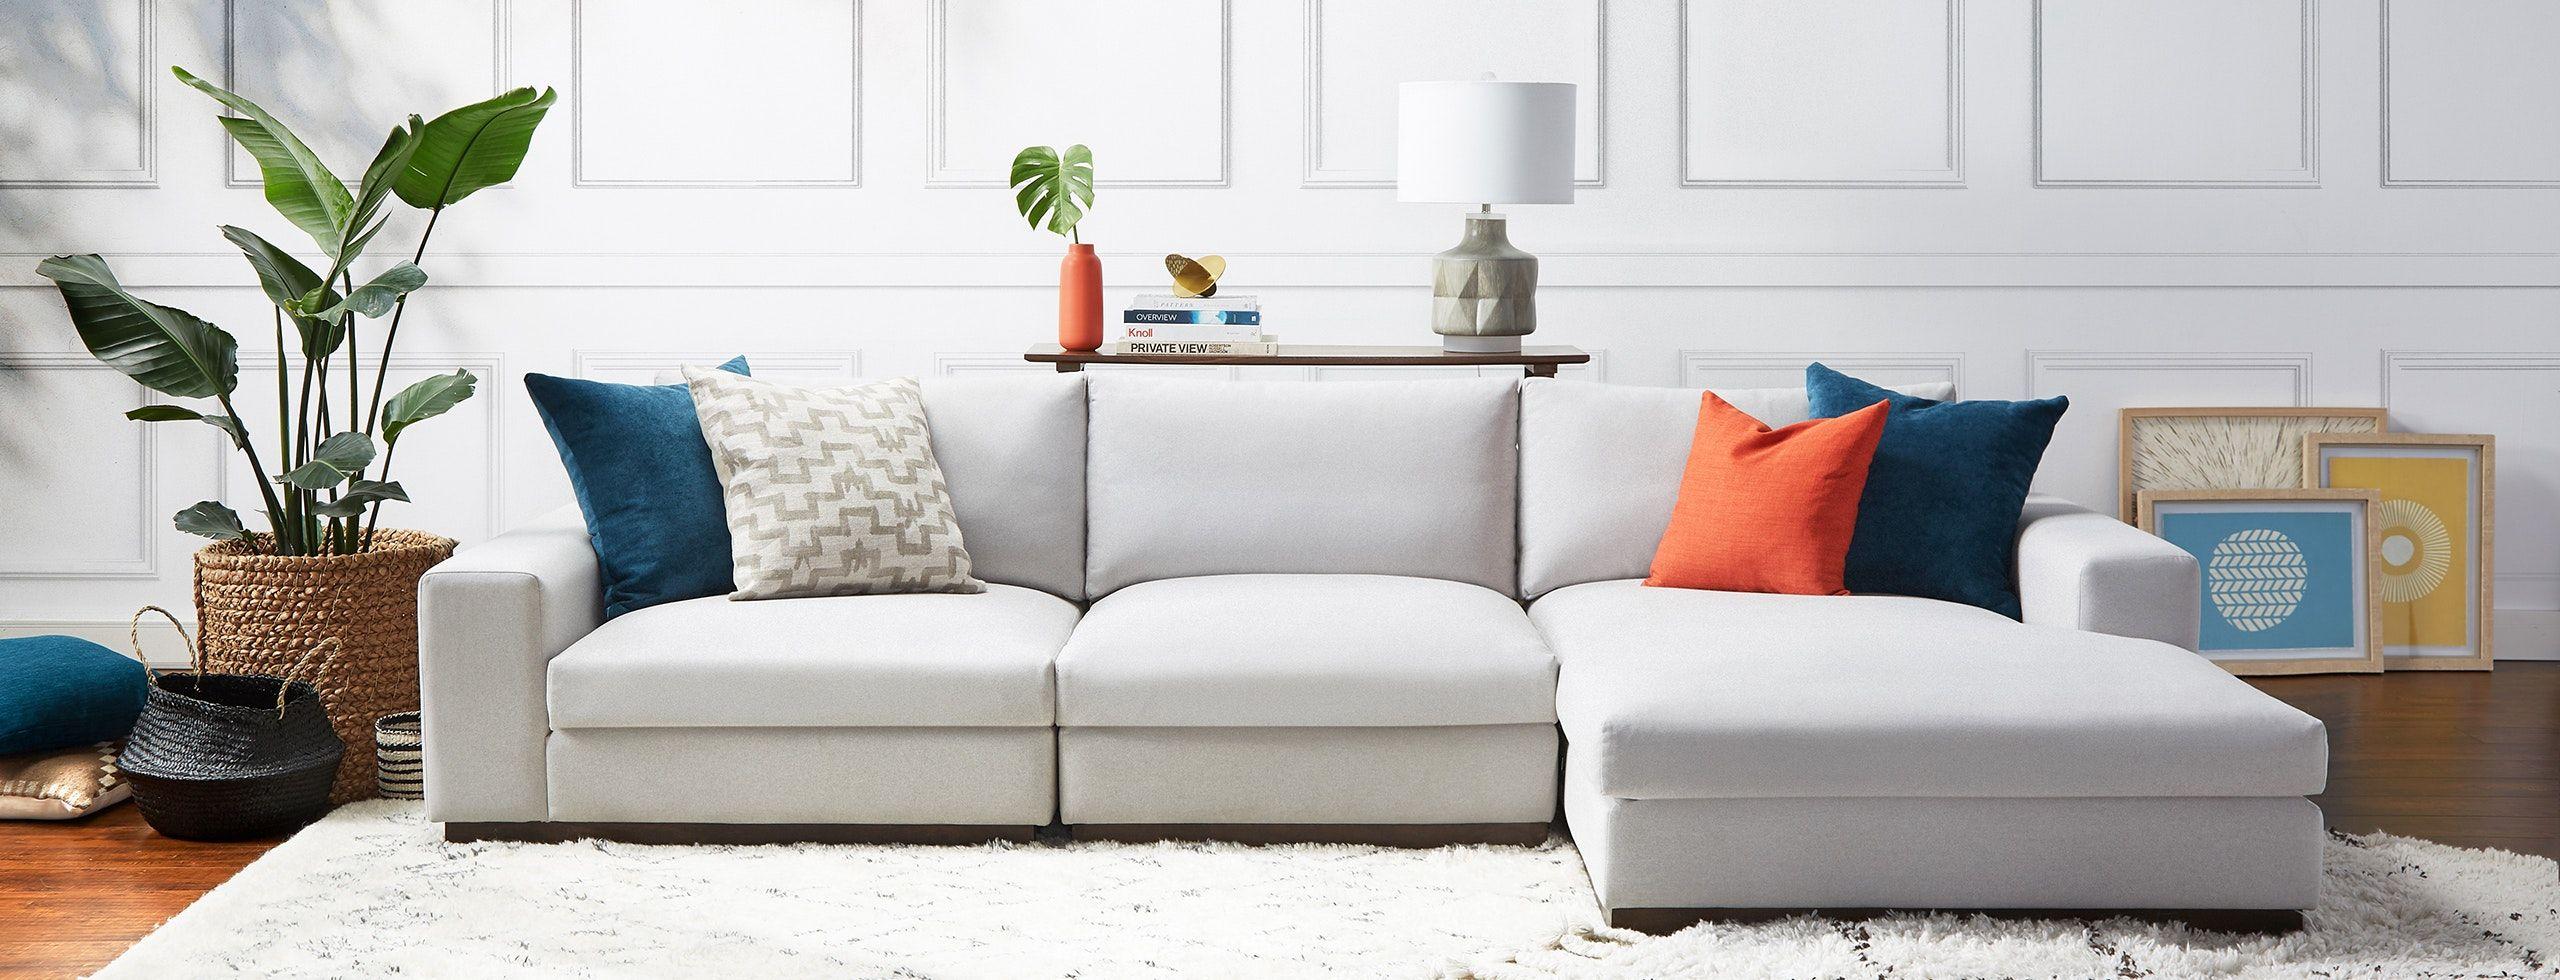 Surprising Holt Modular Sectional In 2019 Decor Modular Sectional Creativecarmelina Interior Chair Design Creativecarmelinacom